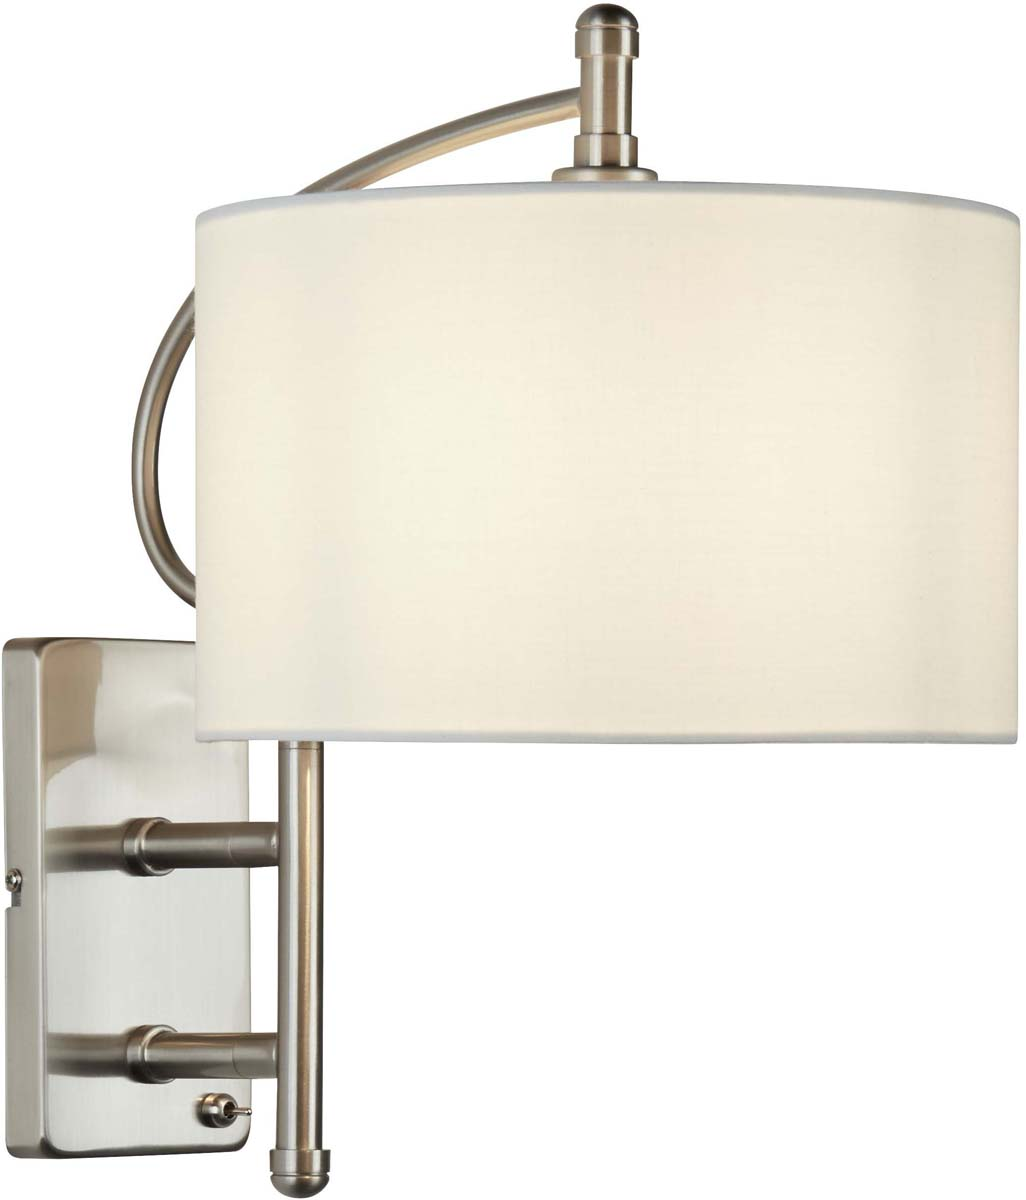 Бра Arte Lamp Adige, 1 х E14, 40 W. A2999AP-1SS бра arte lamp interior a7108ap 1ss page 5 page 2